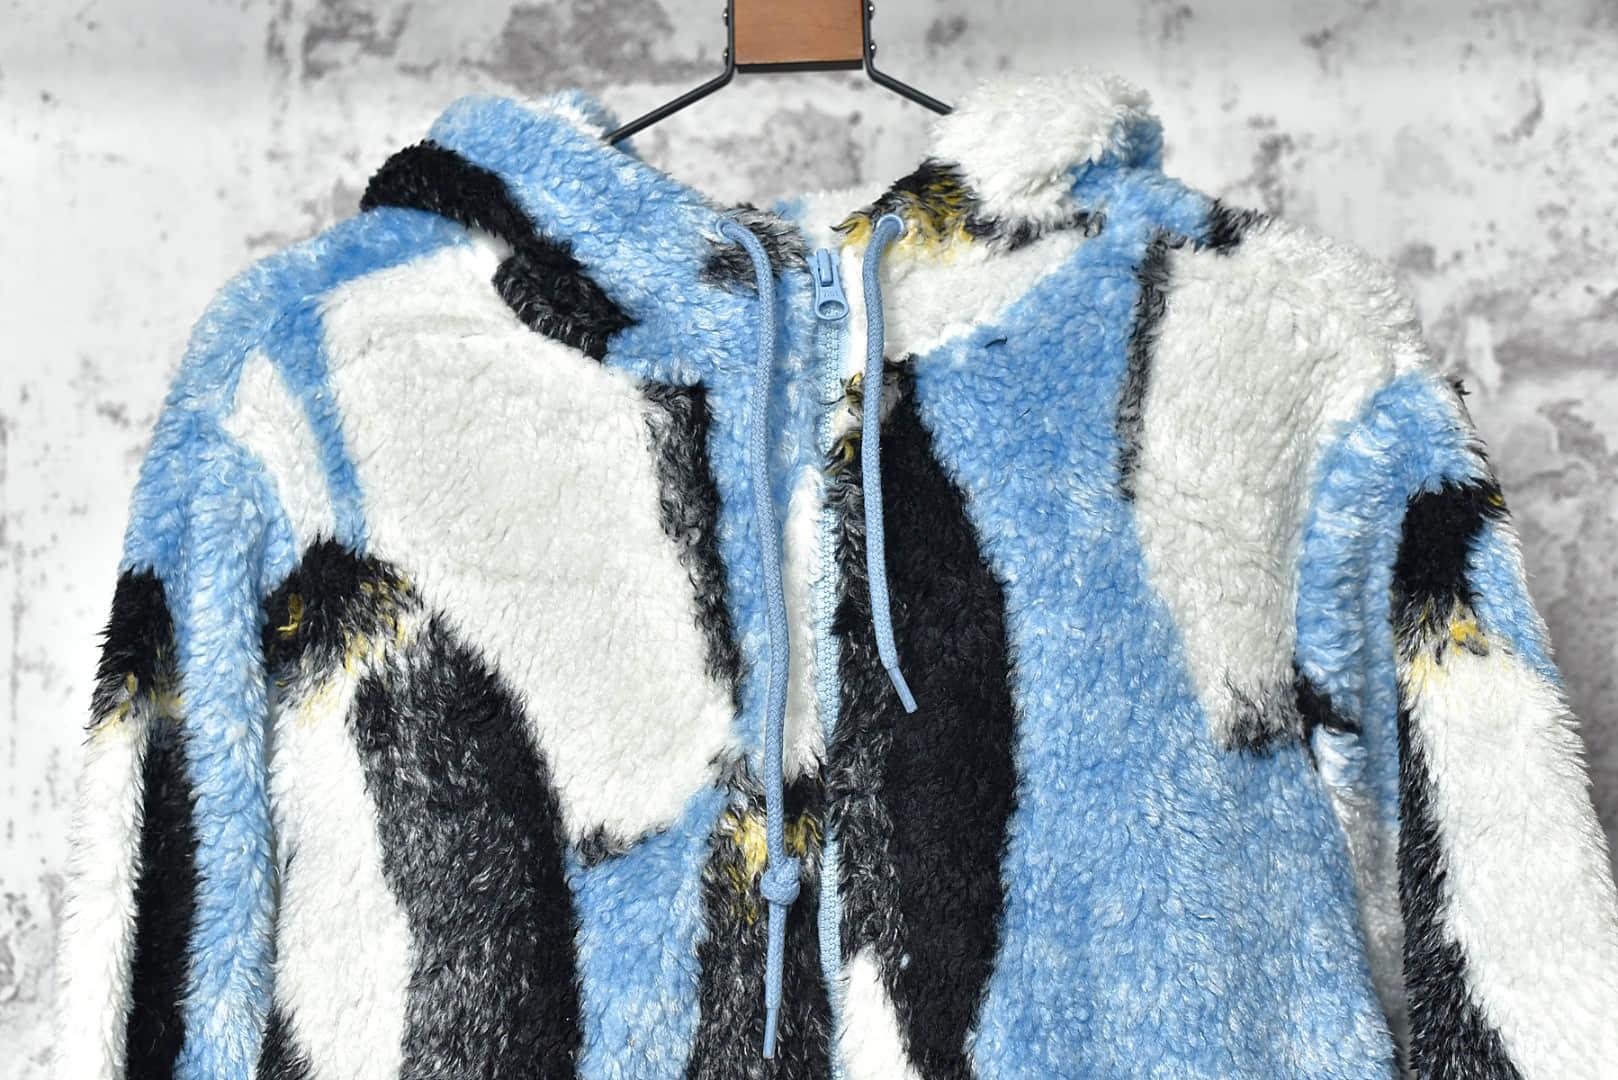 Supreme羽绒服顶级复刻 Supreme 20Fw Penguins Hooded Fleece 进口绒面莆田保暖SUP羽绒服-潮流者之家